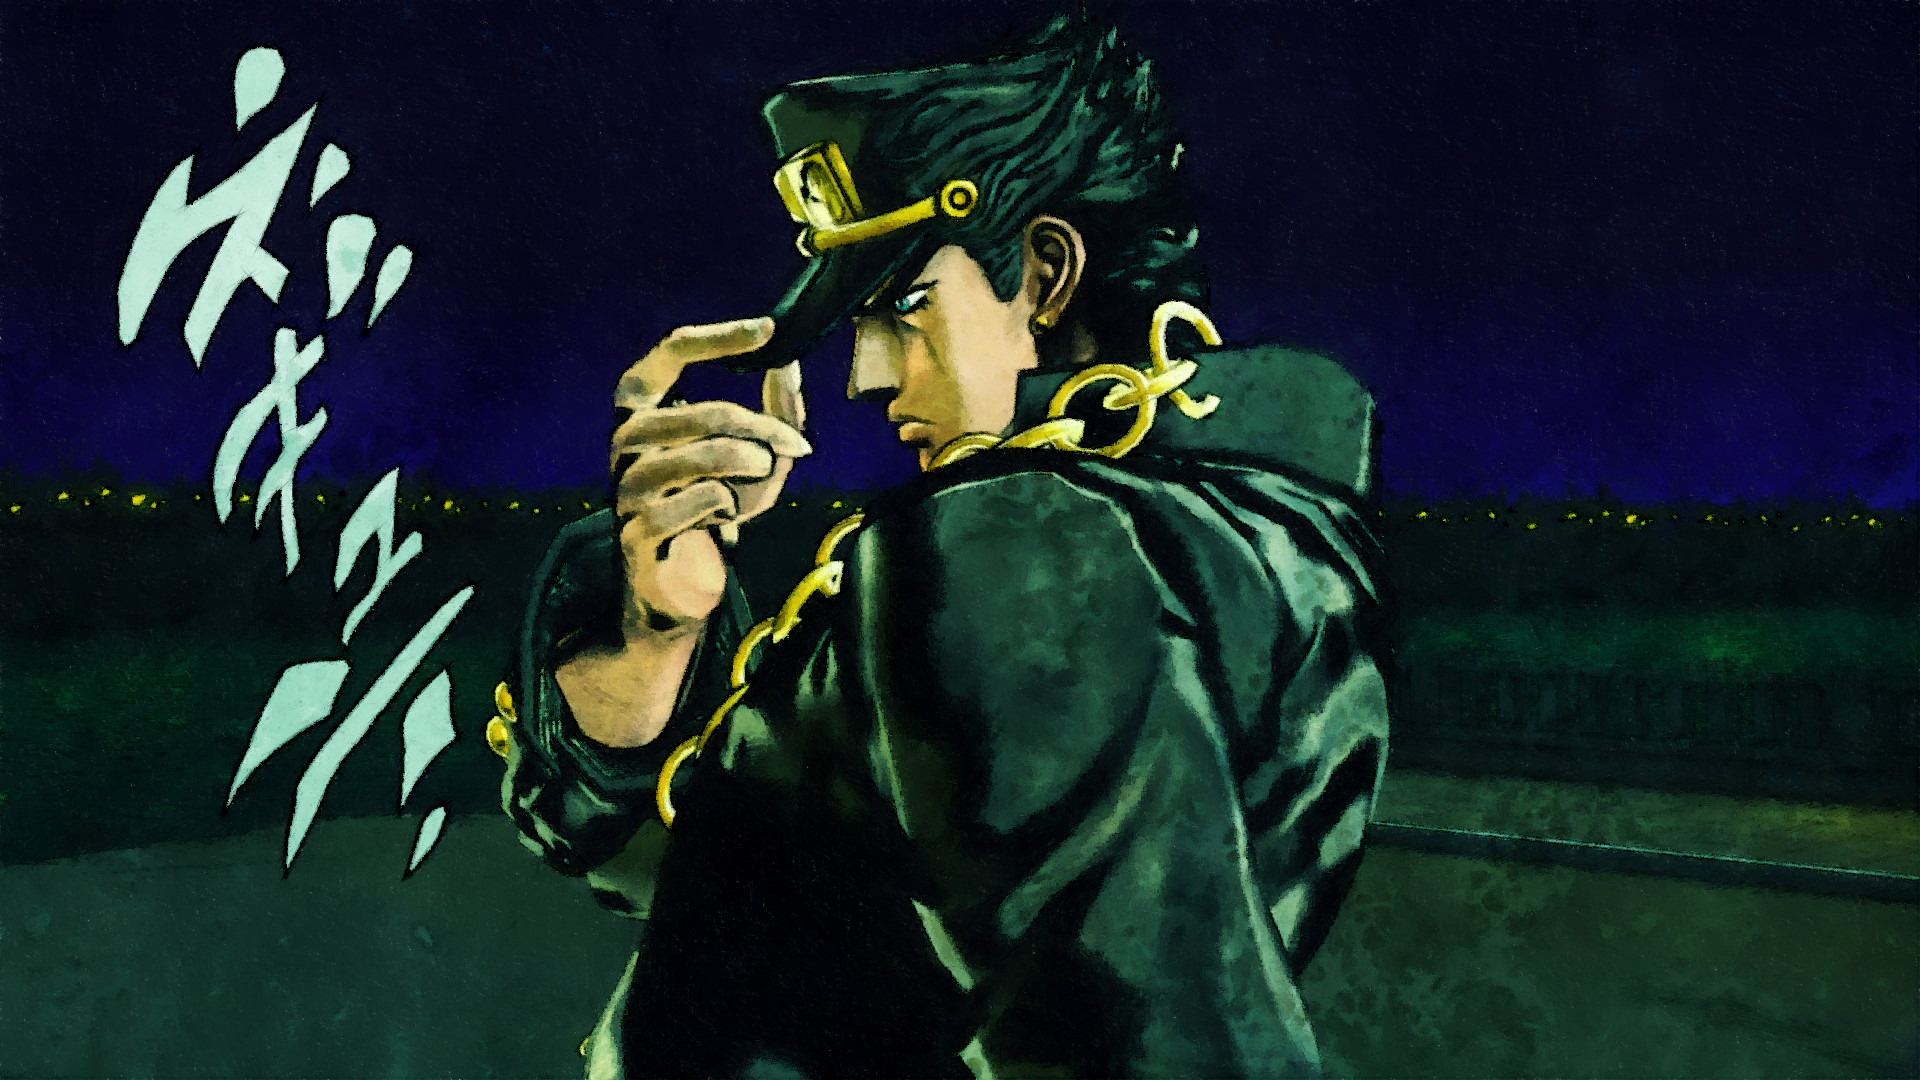 Jotaro Kujo Wallpaper (89+ images)